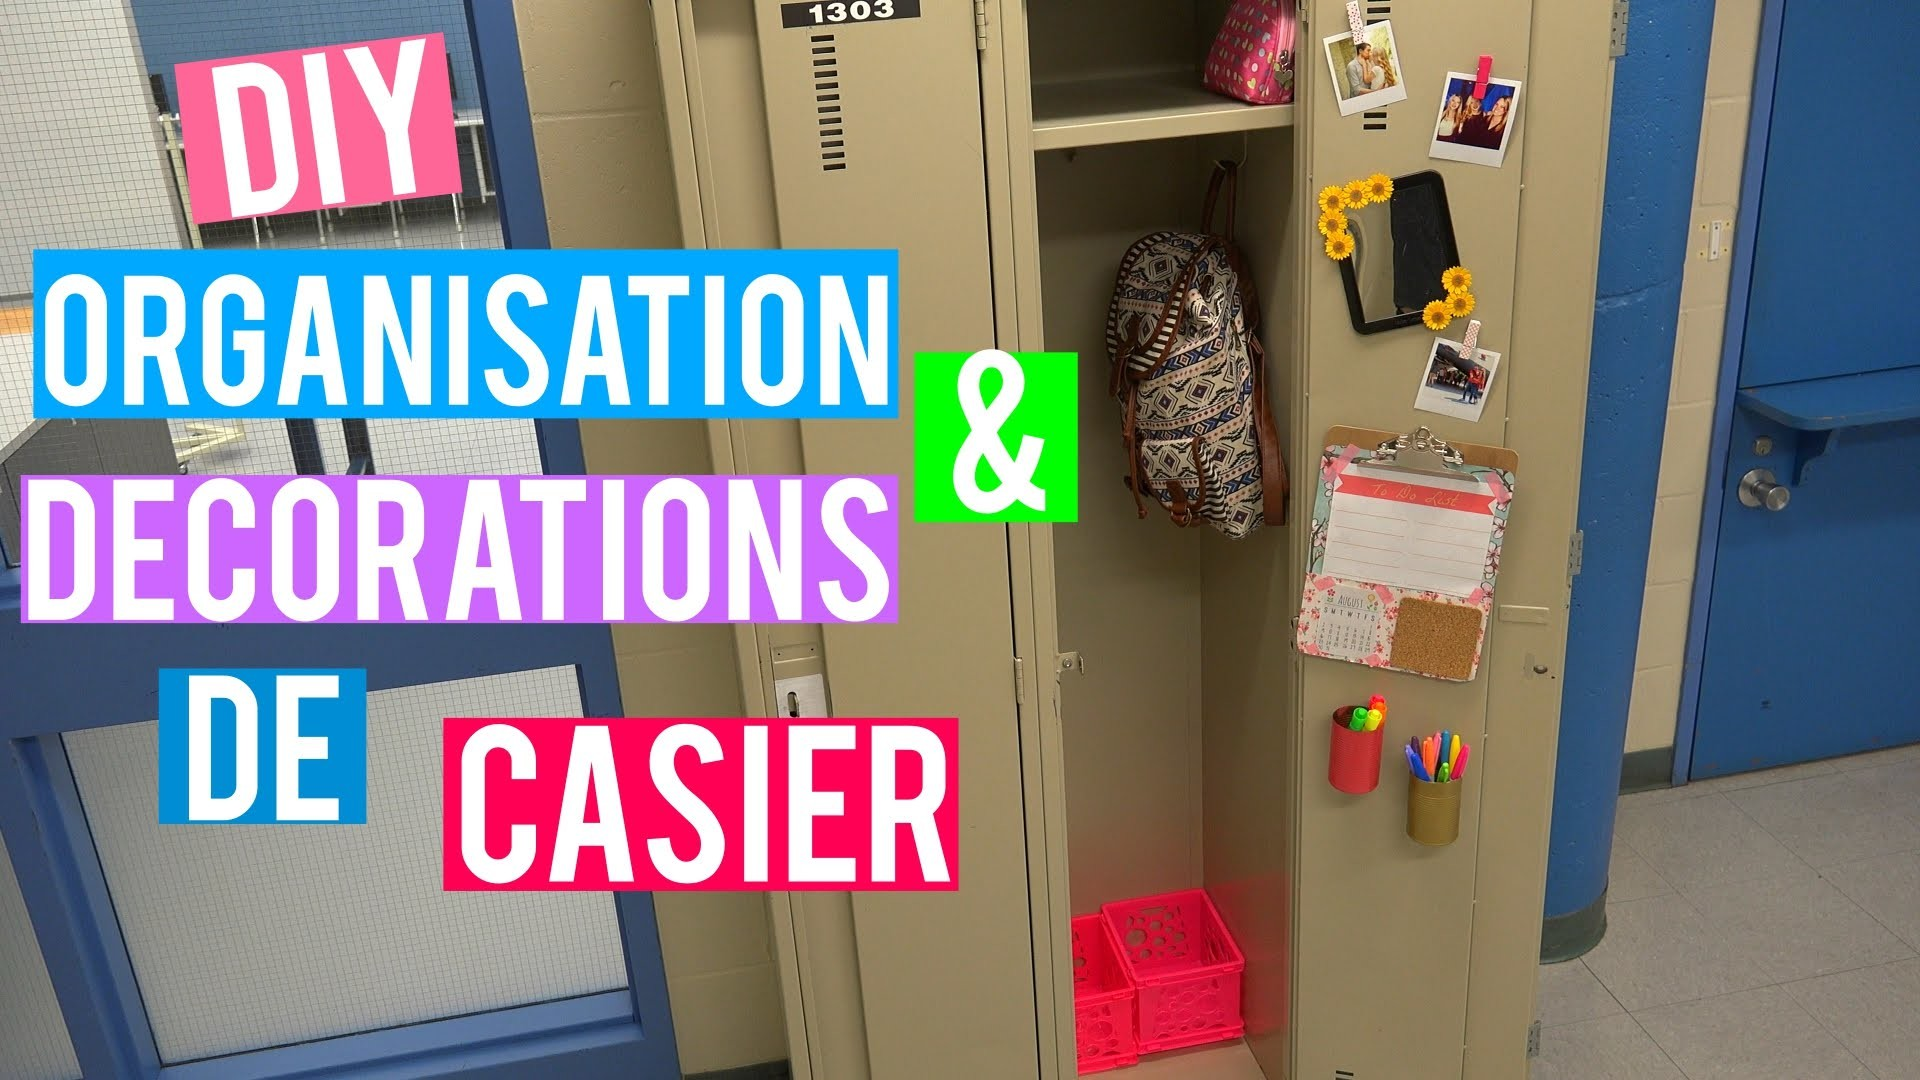 DIY organisation + décorations de casier ! | BACK 2 SCHOOL 2015